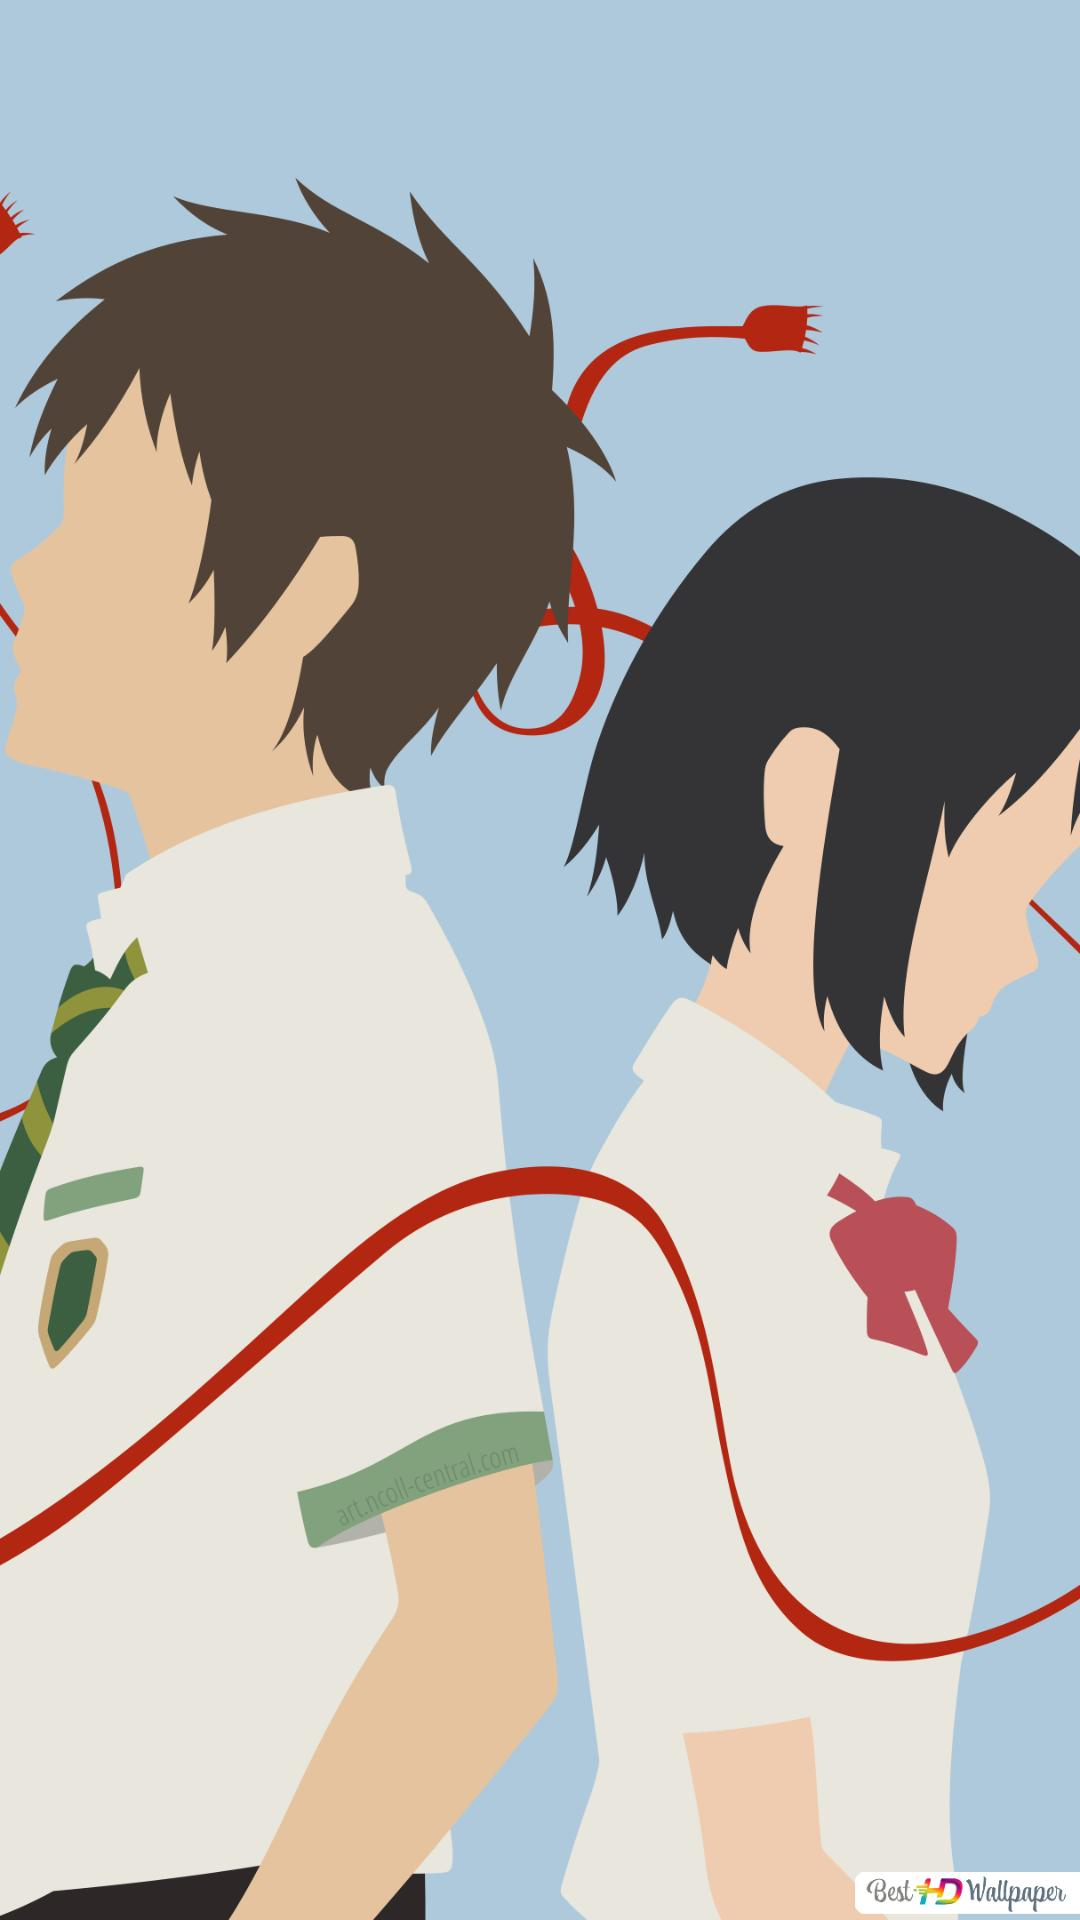 Mitsuha Miyamizu And Taki Tachibana In Your Name Hd Wallpaper Download